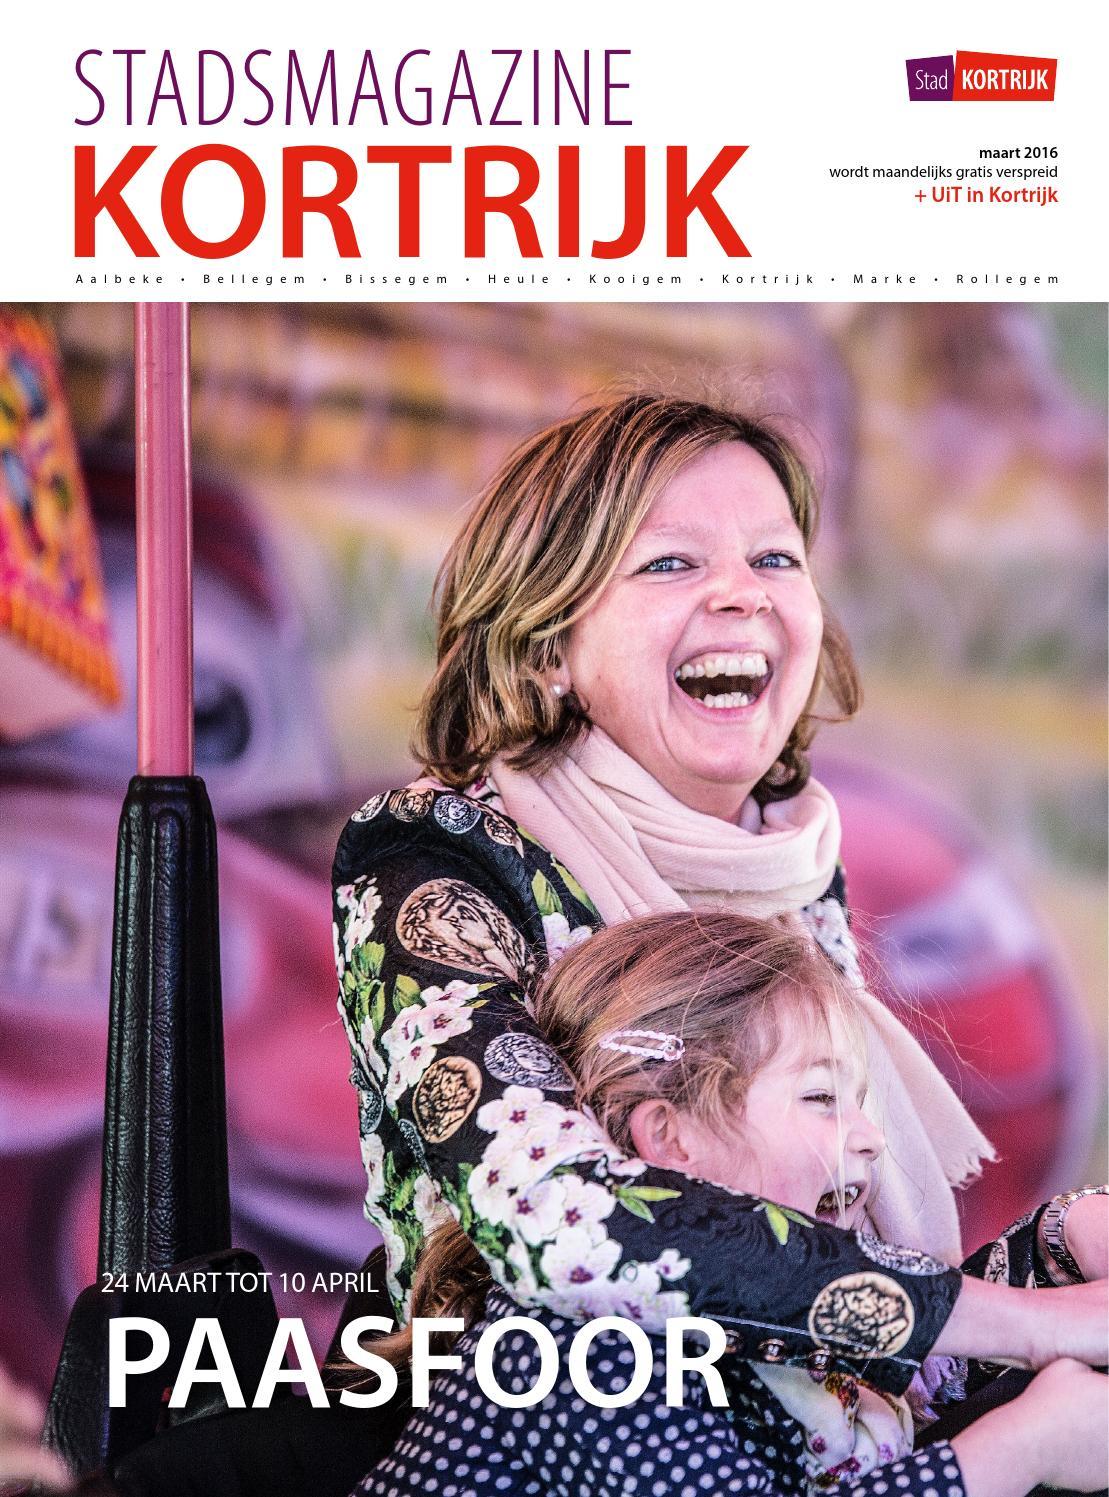 Stadsmagazine kortrijk maart 2016 by stad kortrijk   issuu